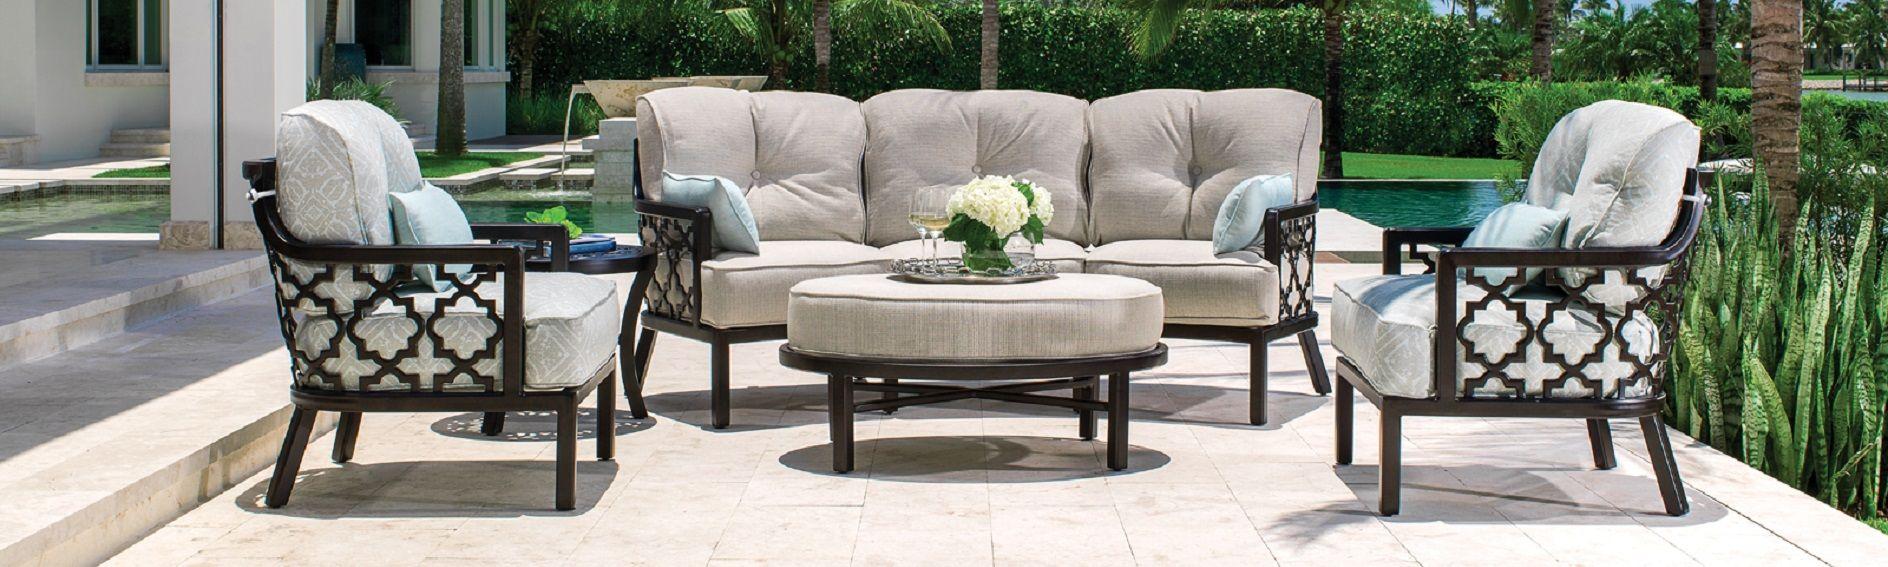 Castelle Patio Furniture Covers Patio Ideas Pinterest Patio